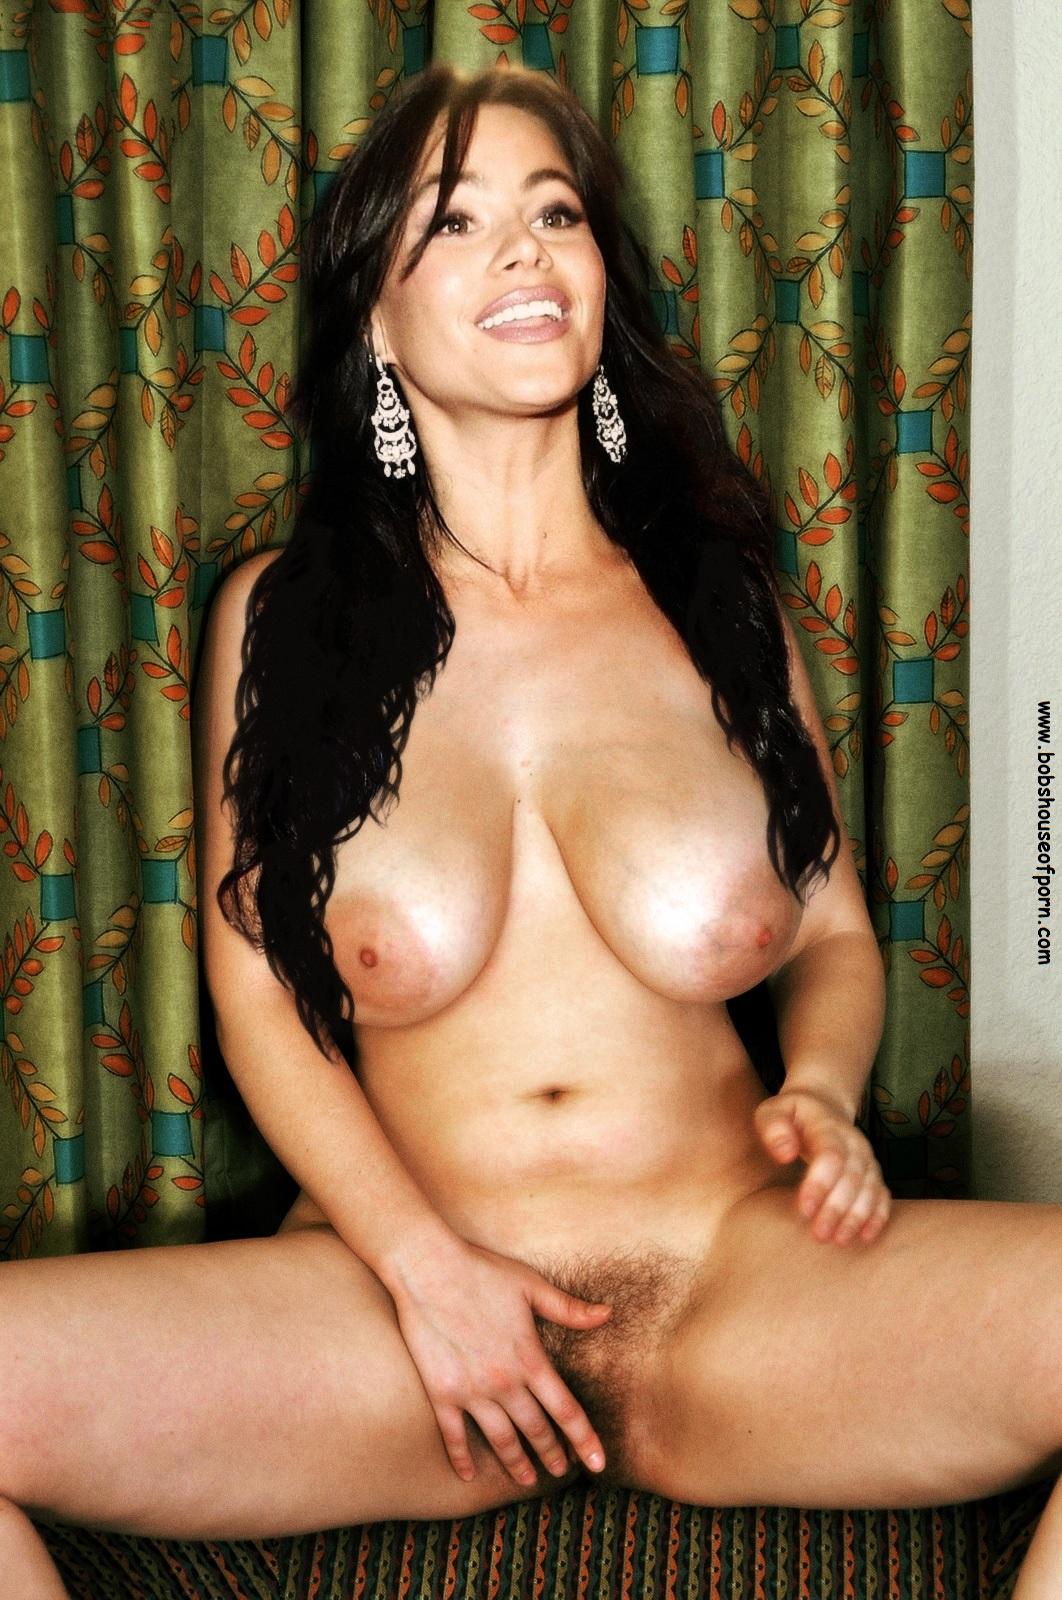 big Sofia naked vergara boobs